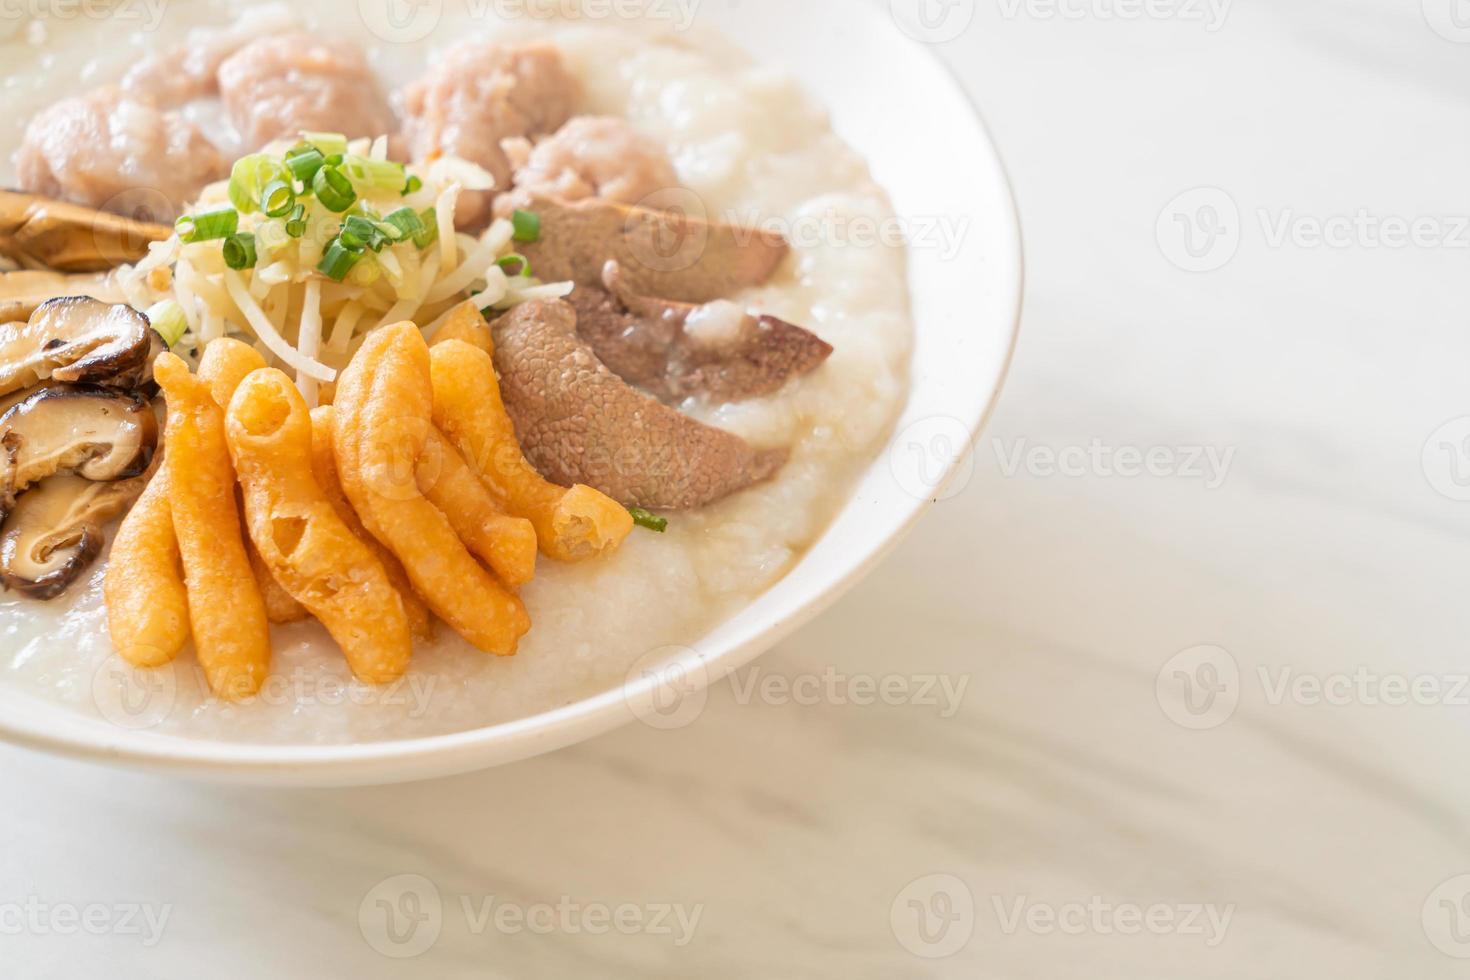 Pork Congee or Porridge with Pork photo